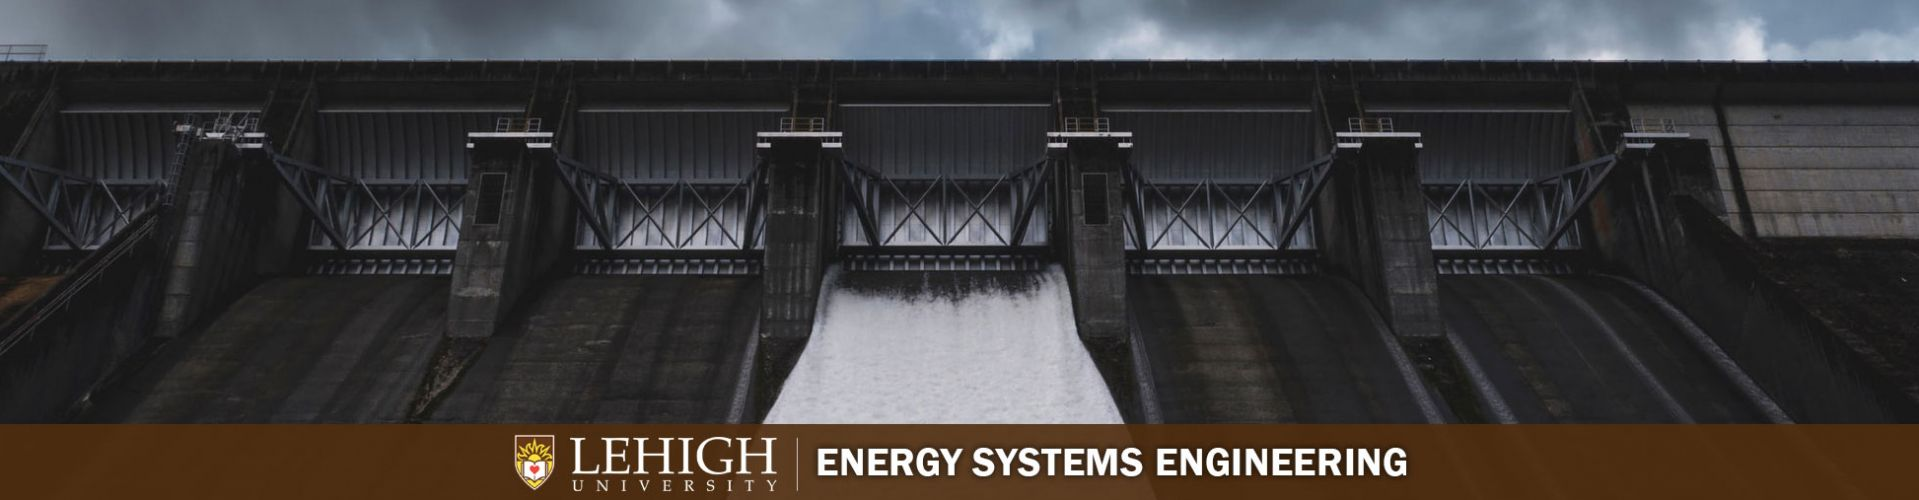 Energy Systems Engineering @ Lehigh University